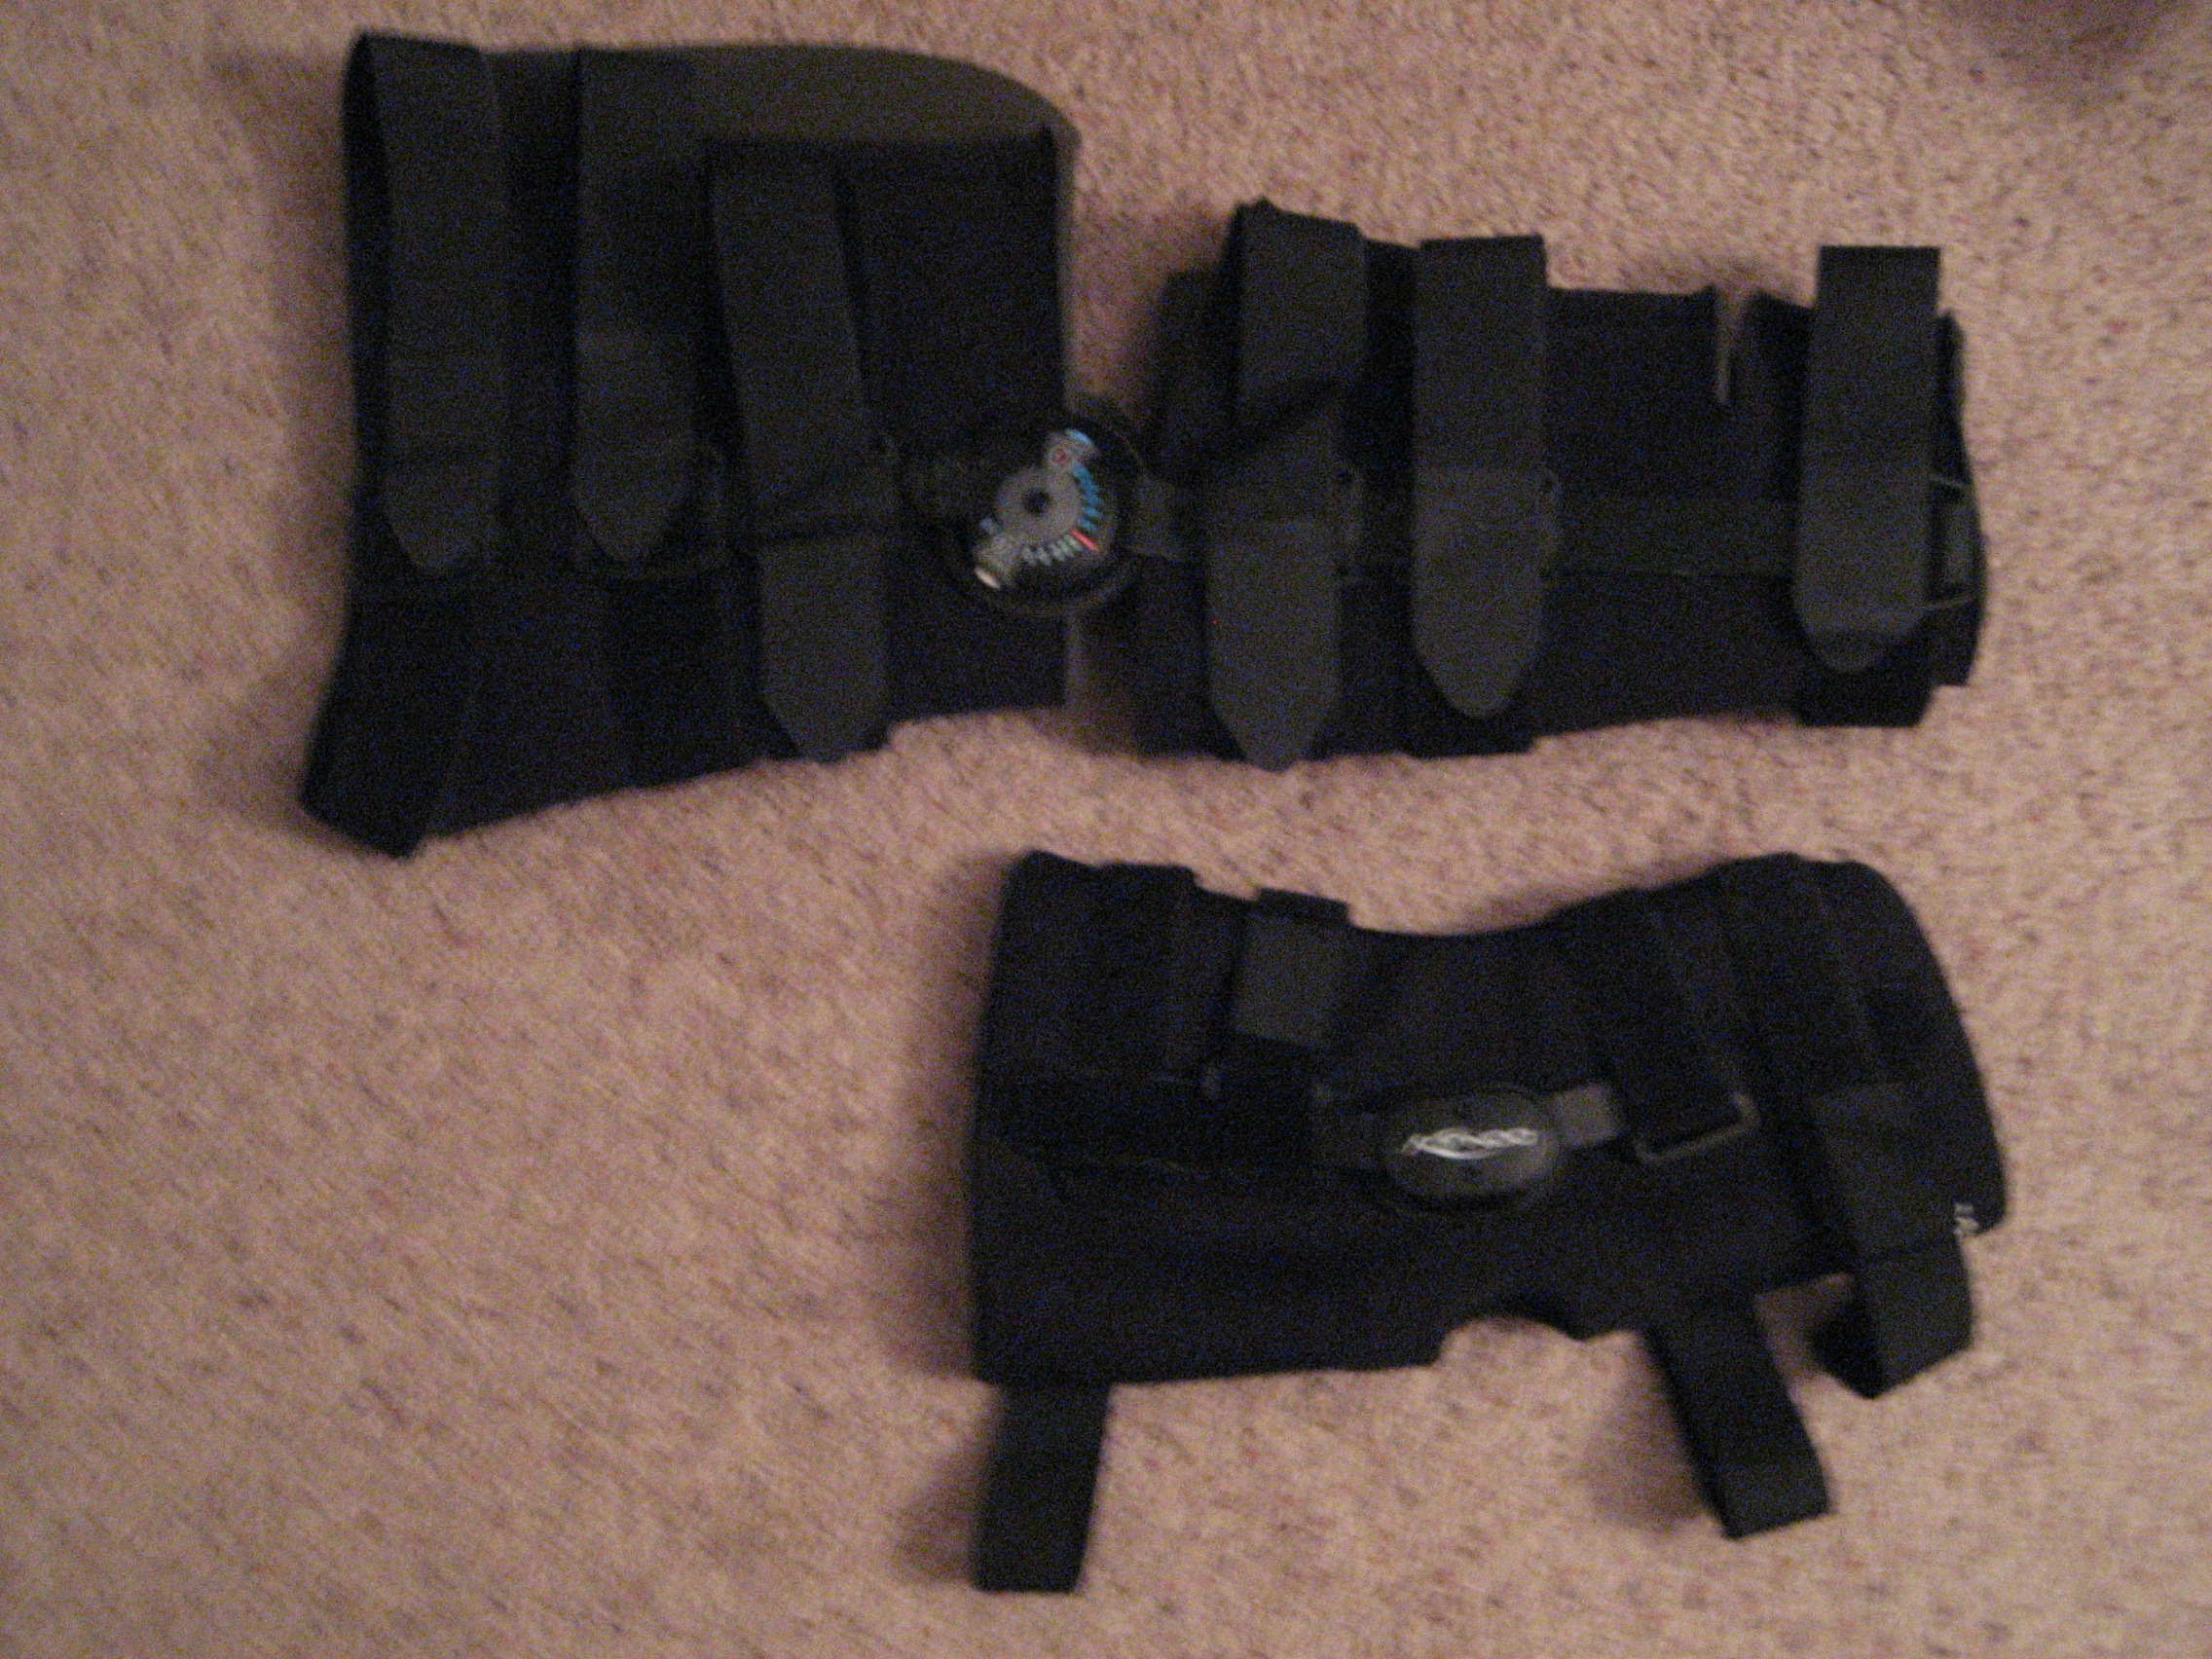 leg braces: compared